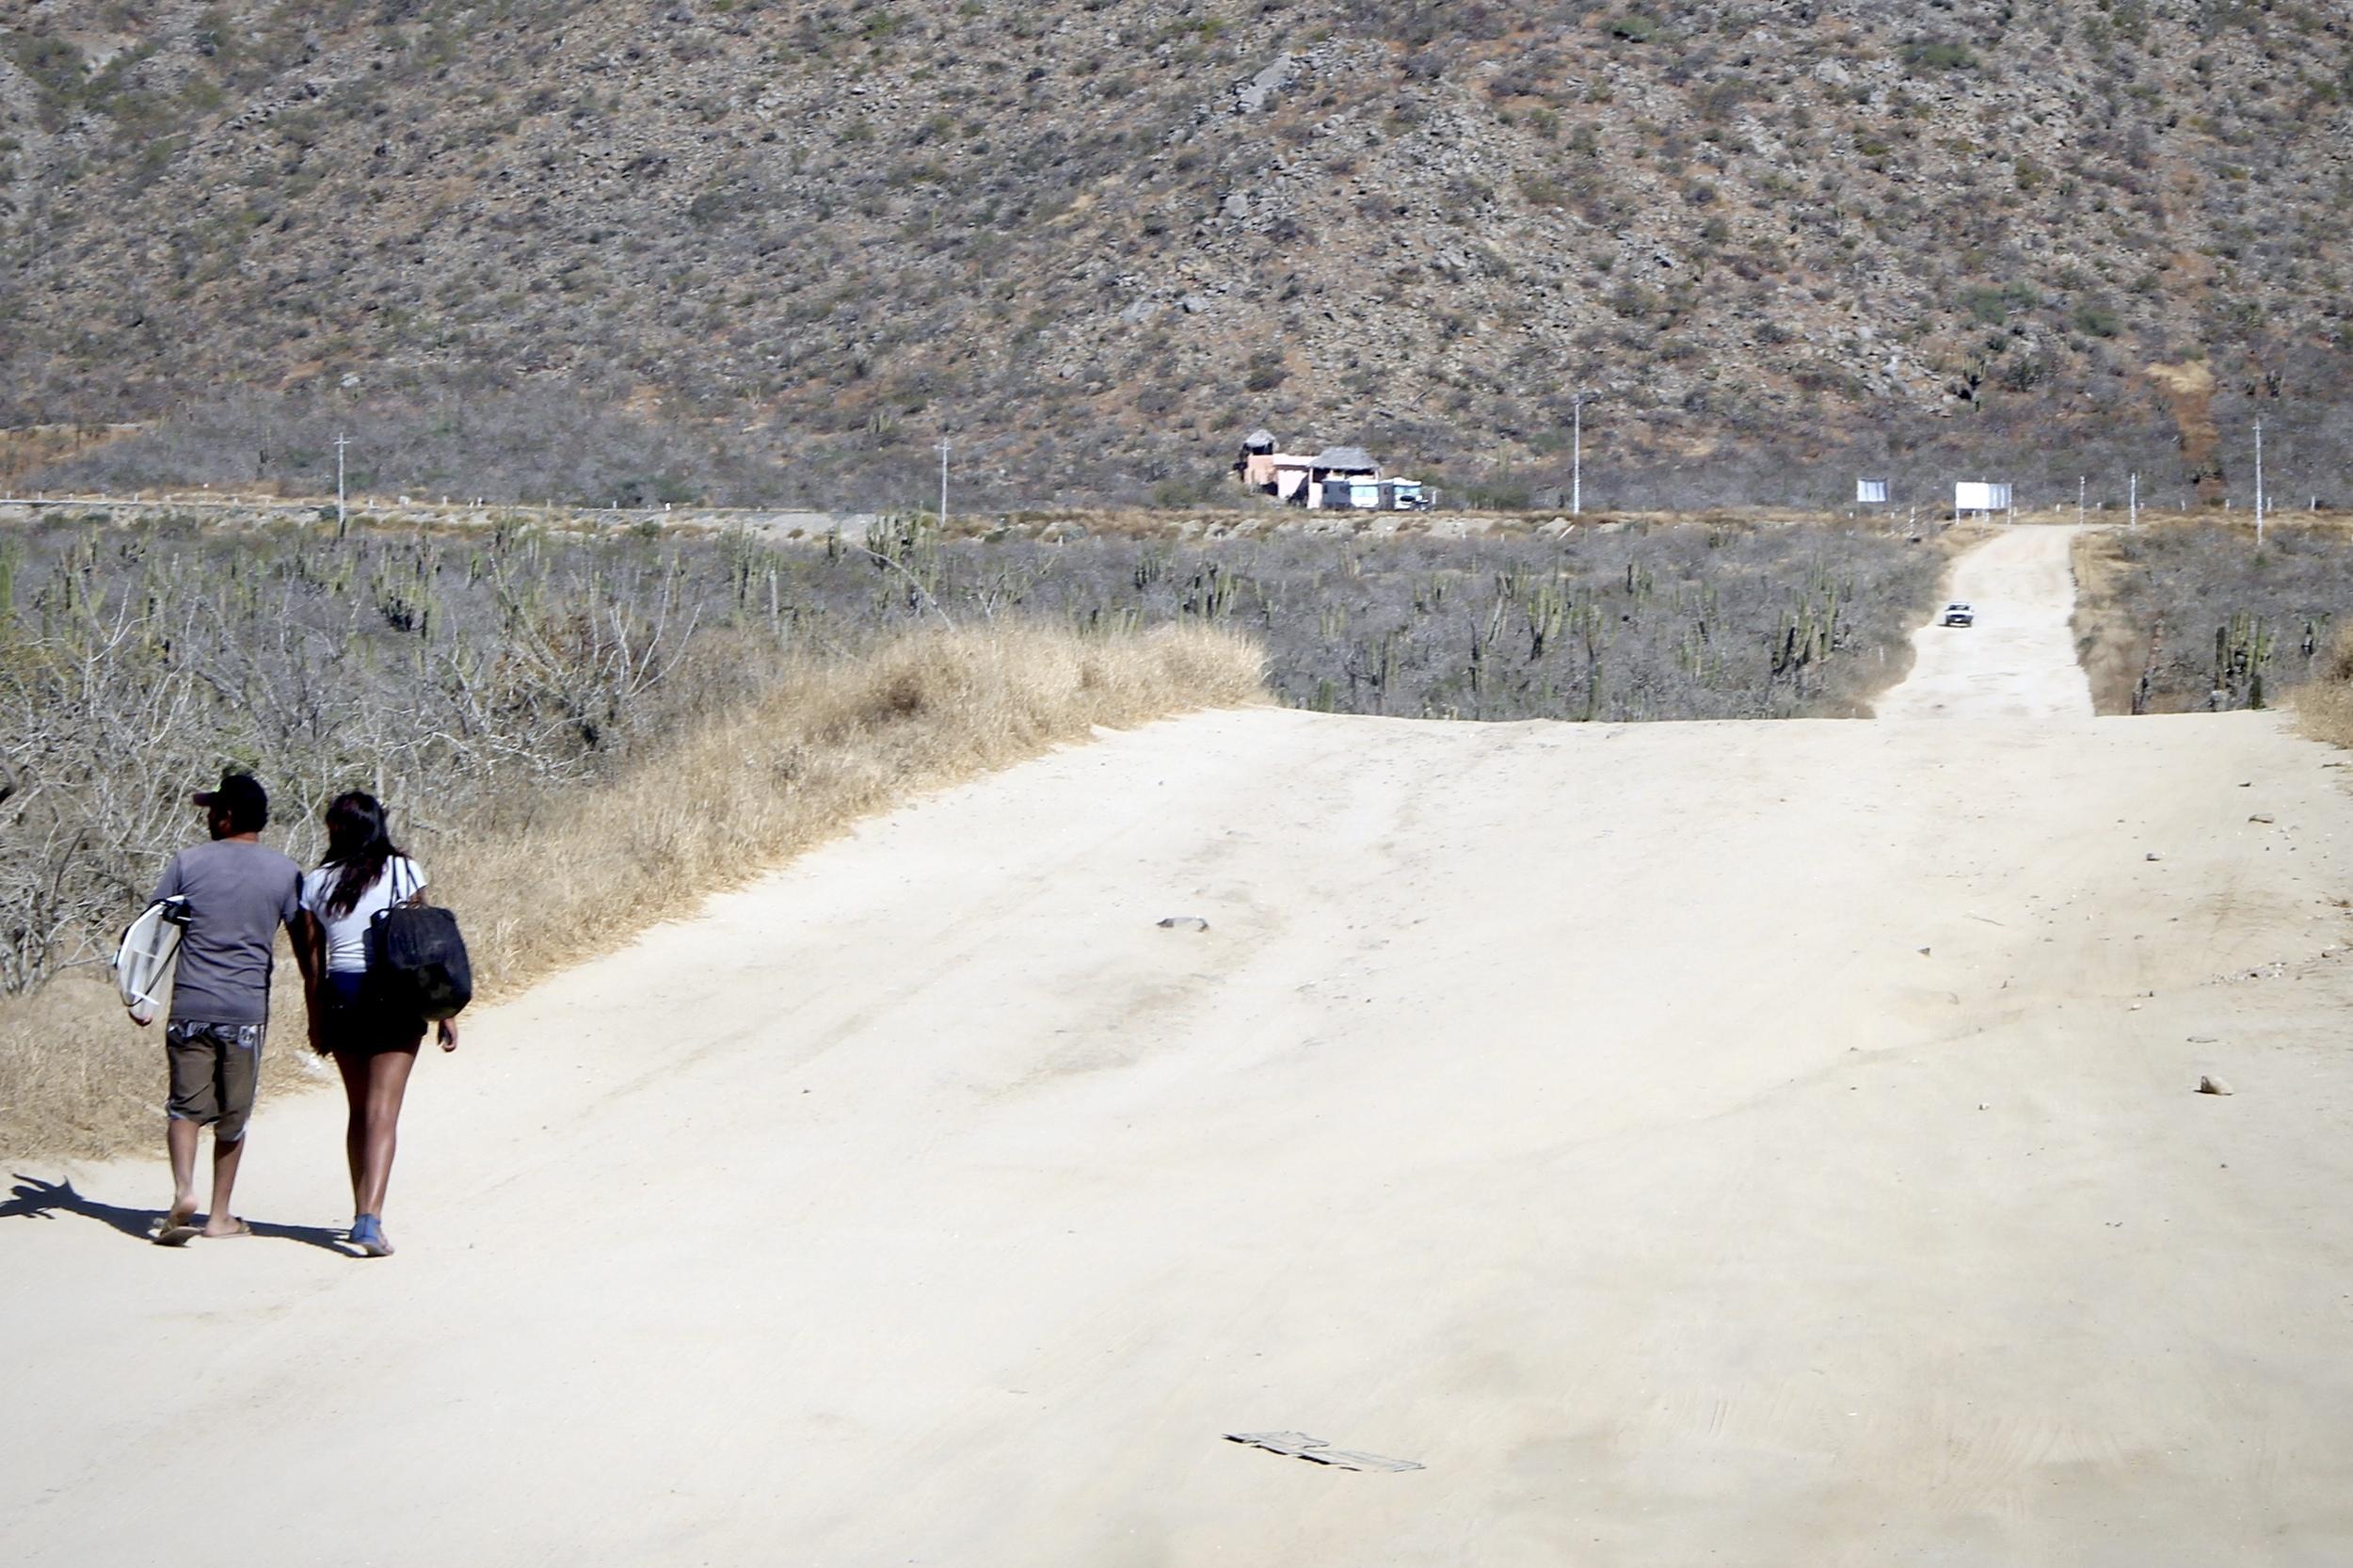 the dusty roads of baja california